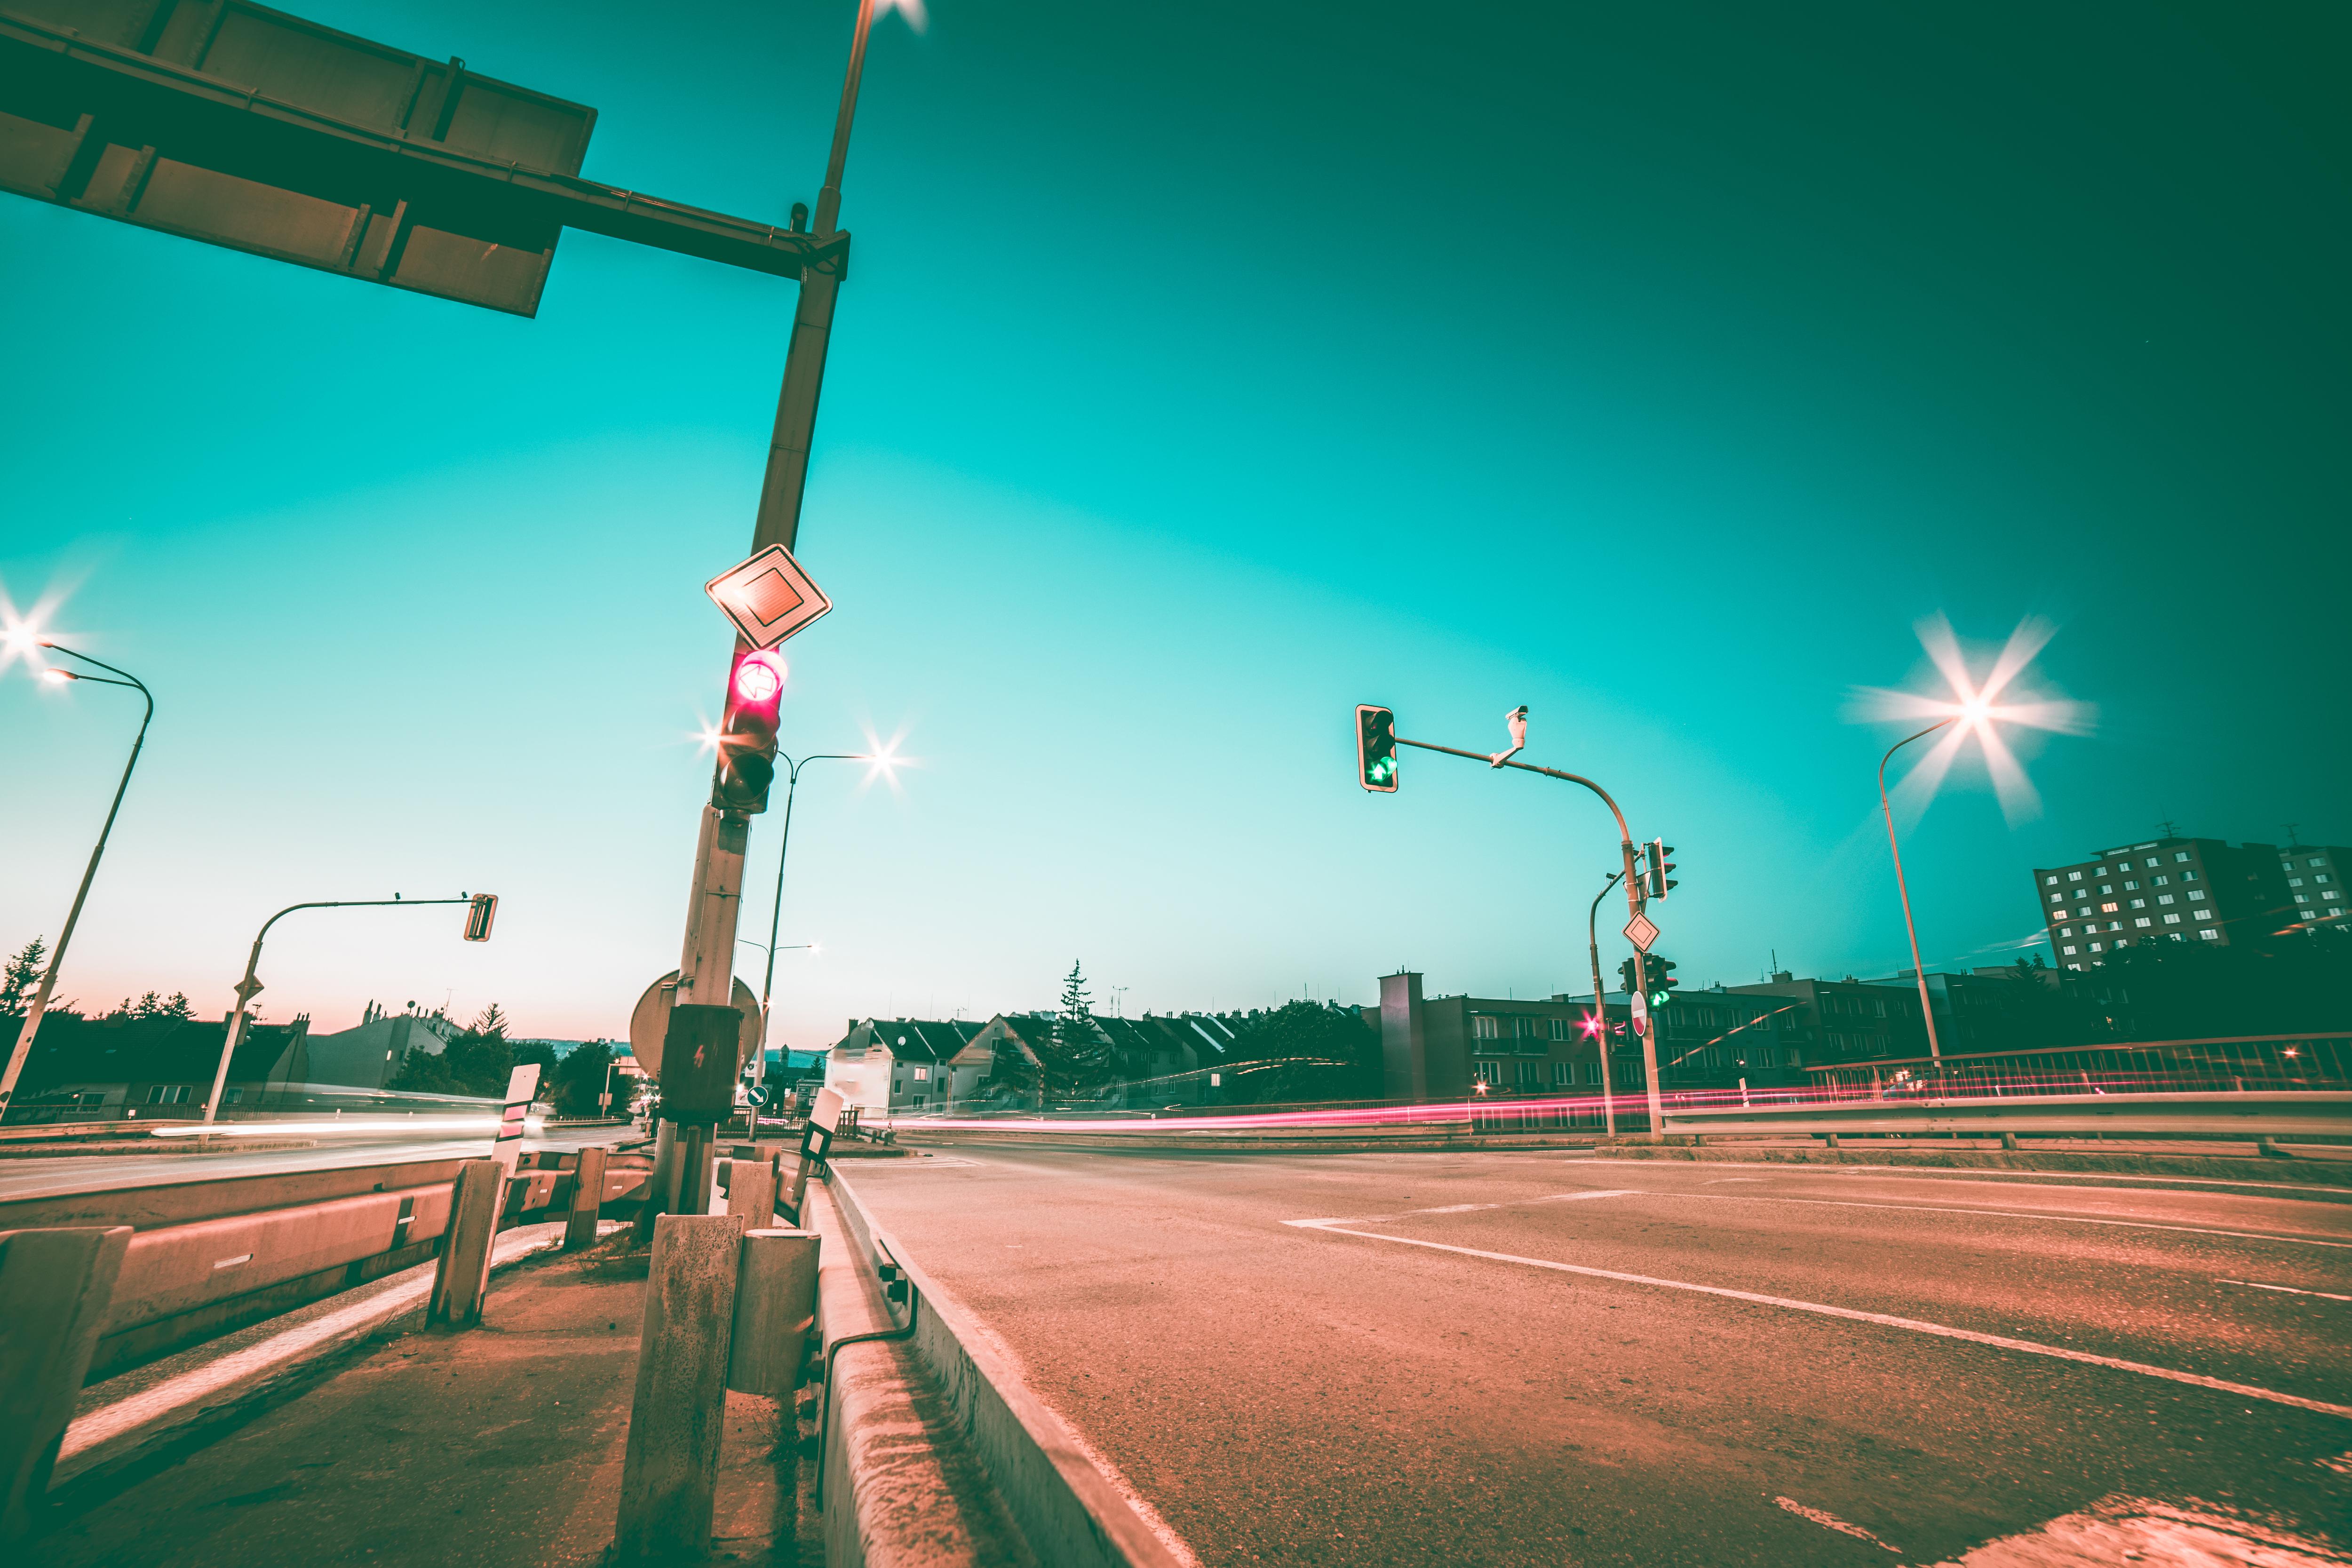 road-intersection-and-traffic-lights-2-picjumbo-com